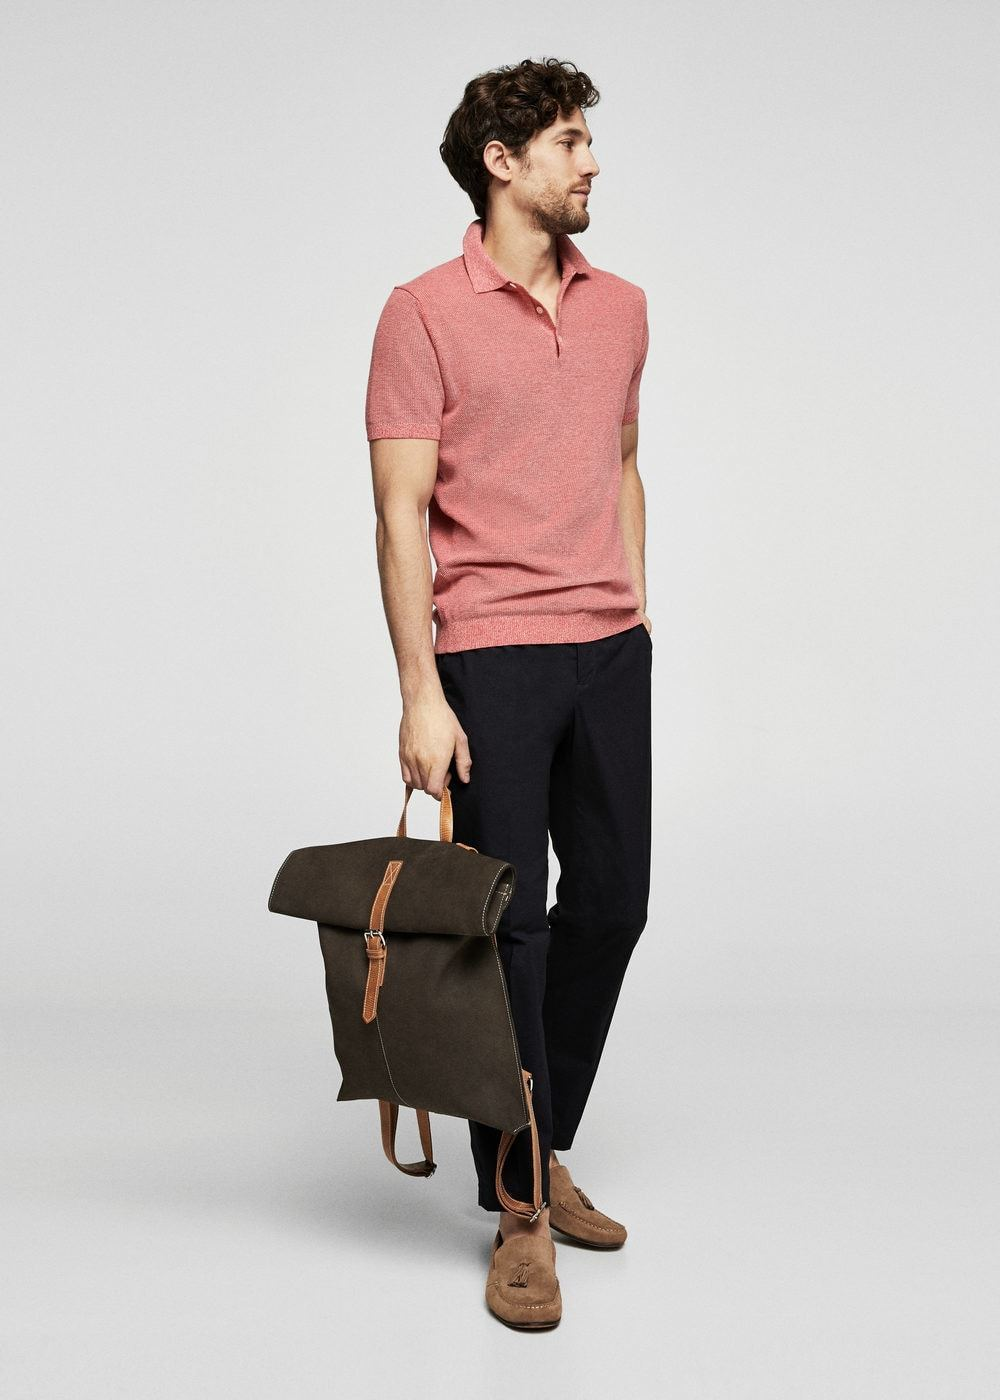 be8fc694a6 Un pantalón chino de vestir con una camisa polo rosada (4 looks de moda)